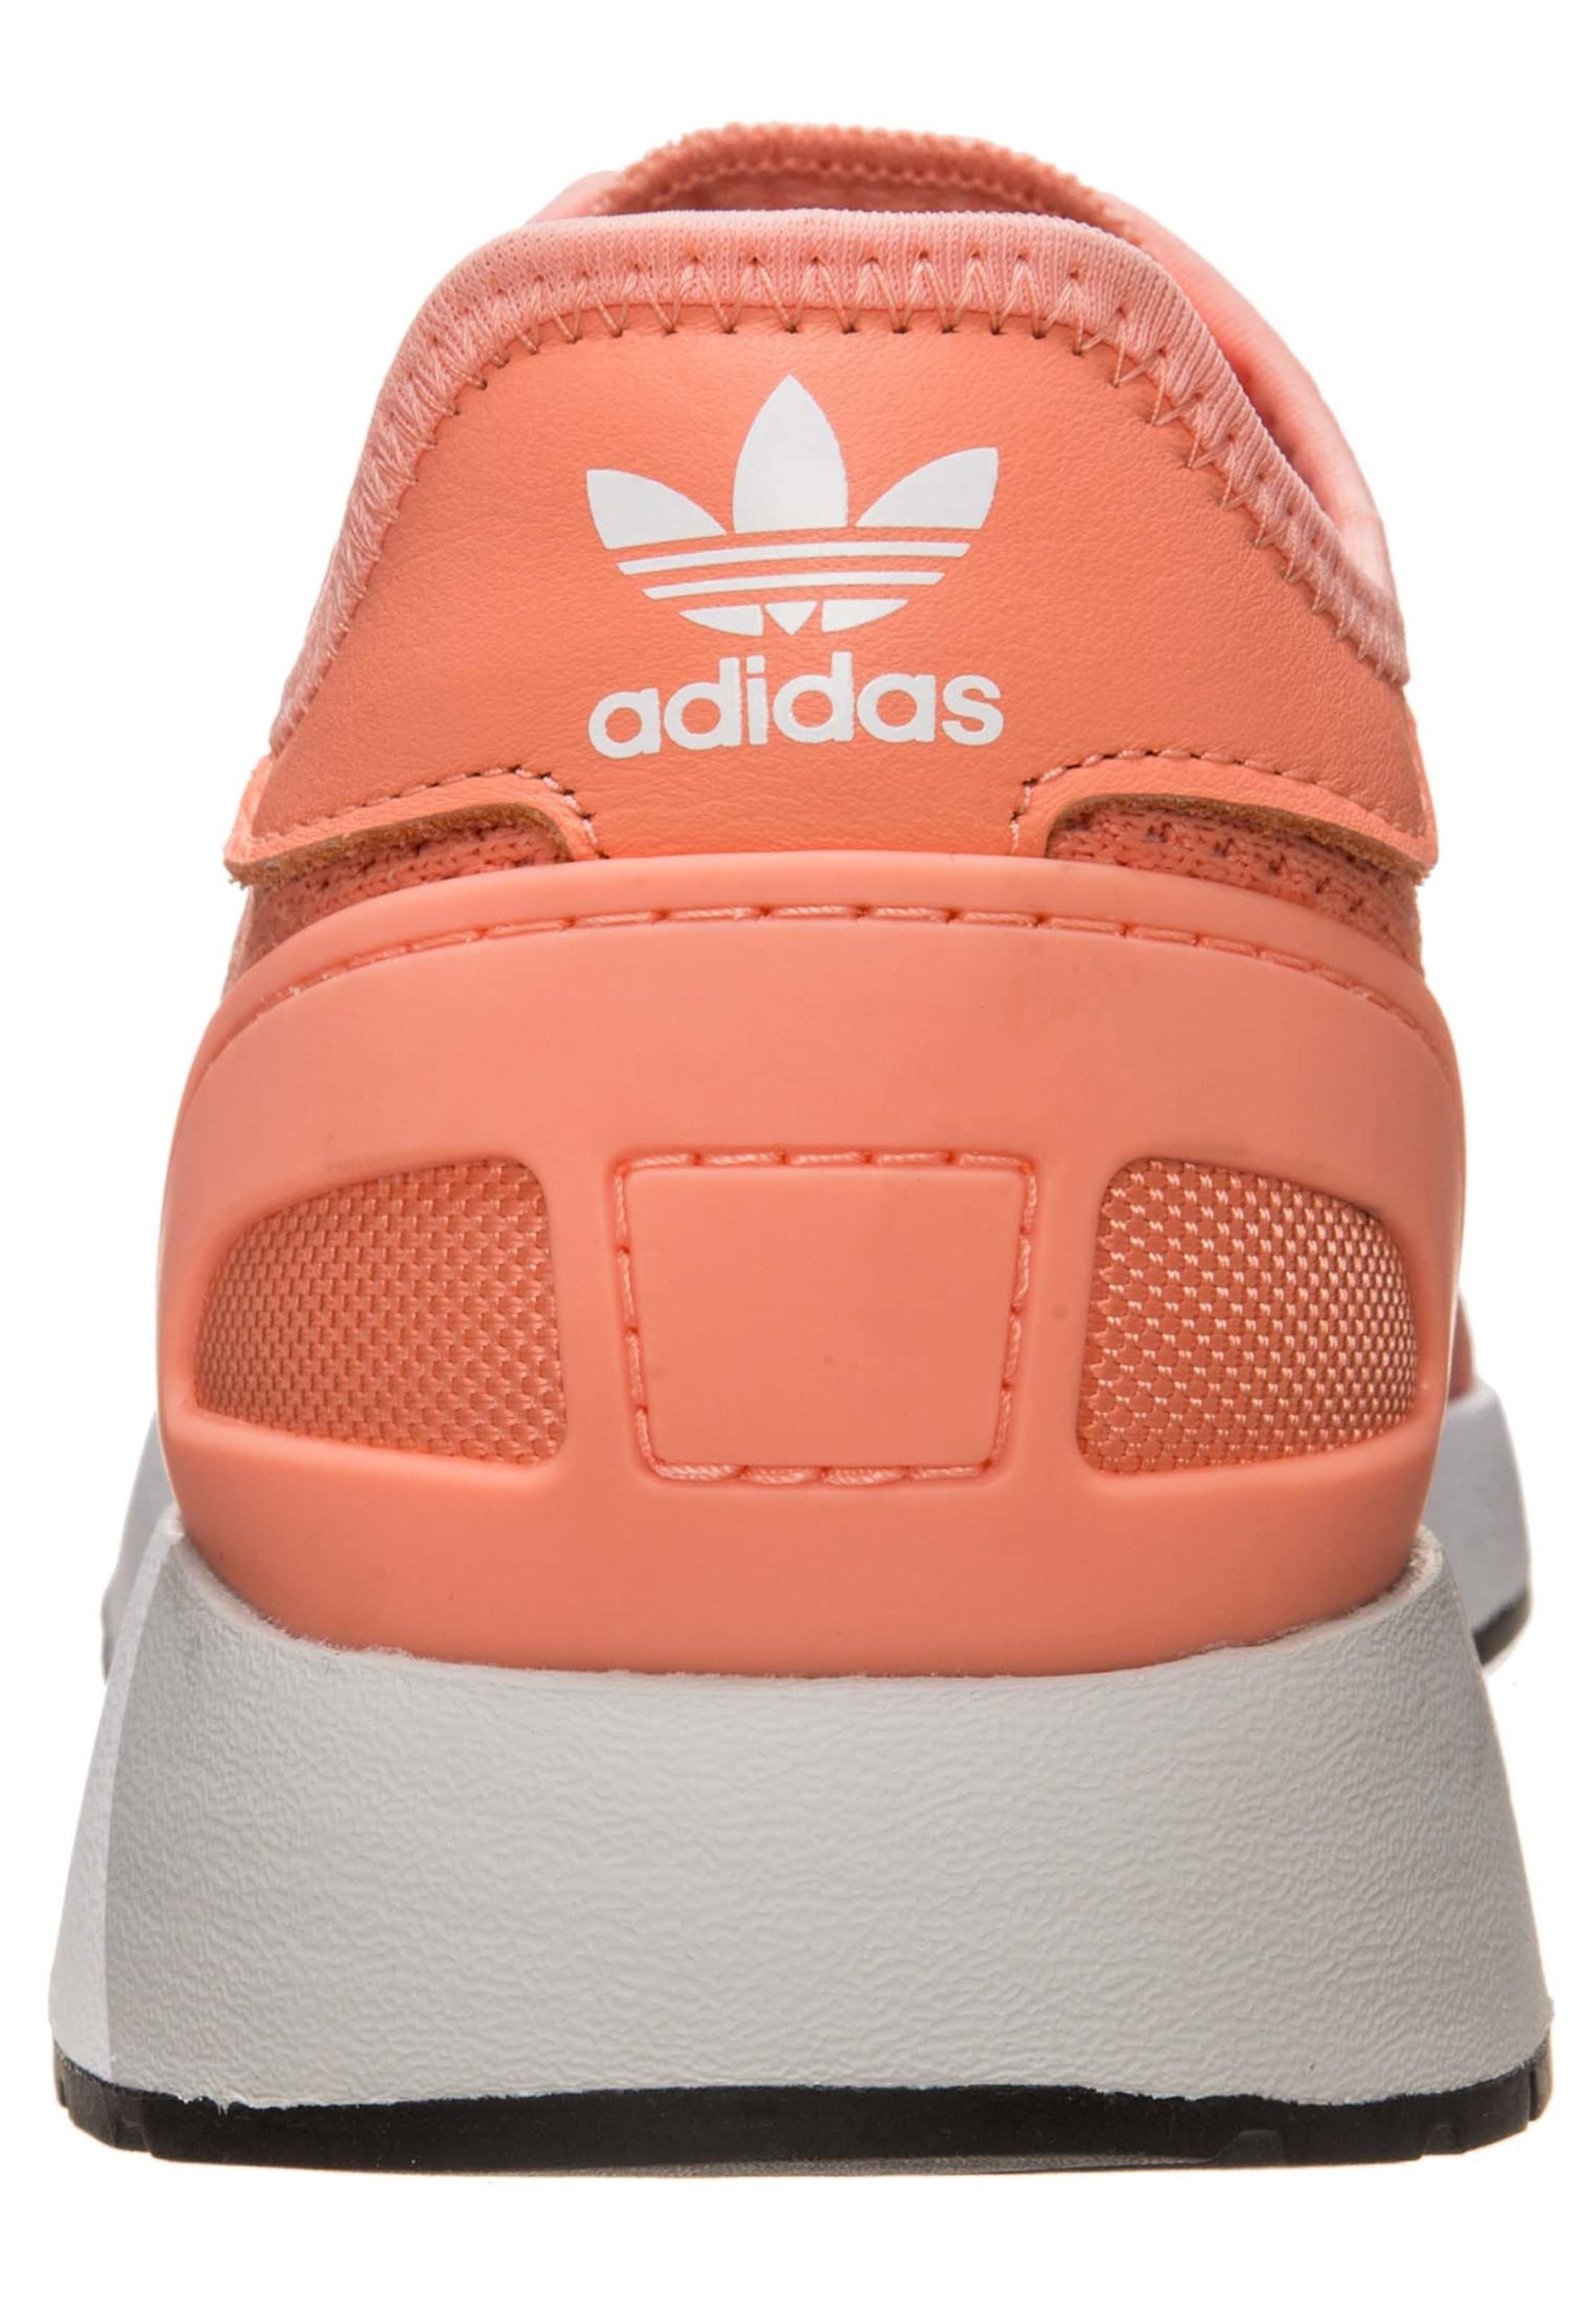 Baskets Rouge Adidas Basses 'n 5923' En Originals 0wXZNnOP8k